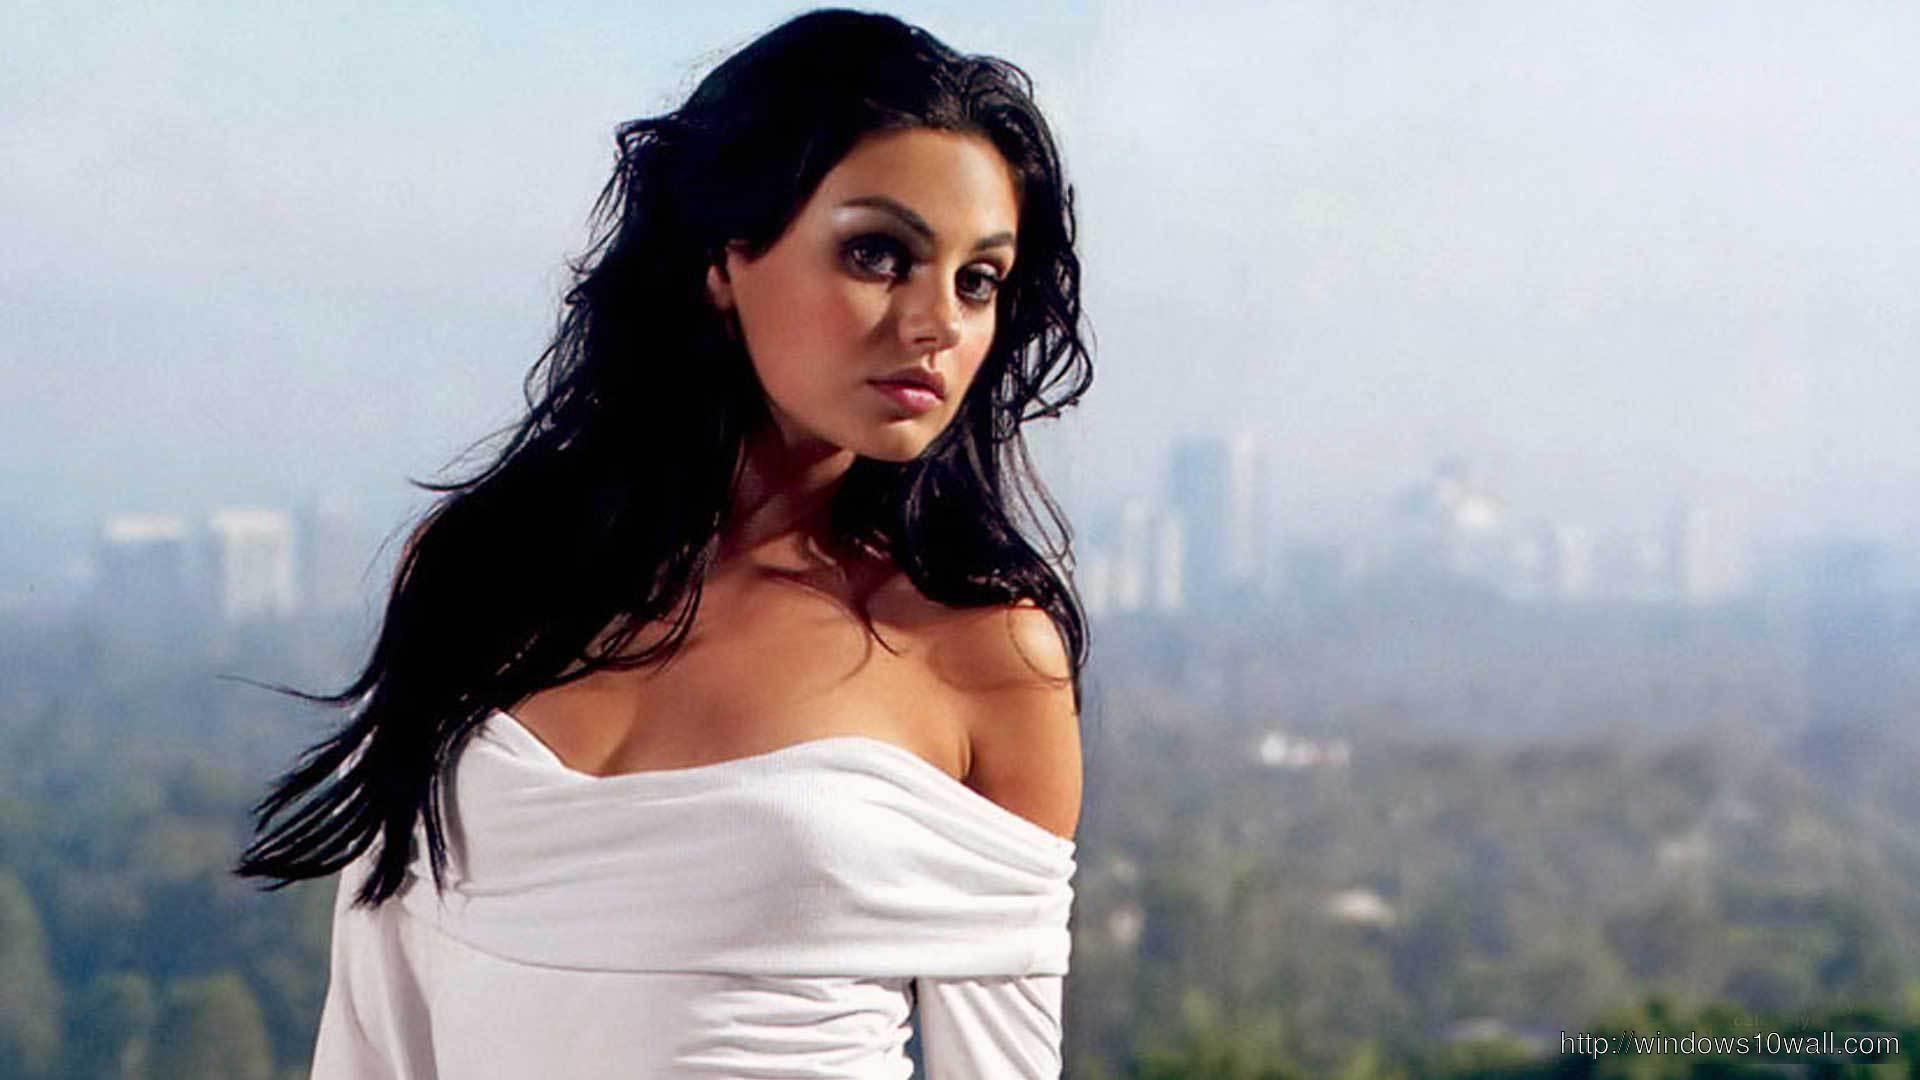 Mila Kunis Hot Background Wallpaper